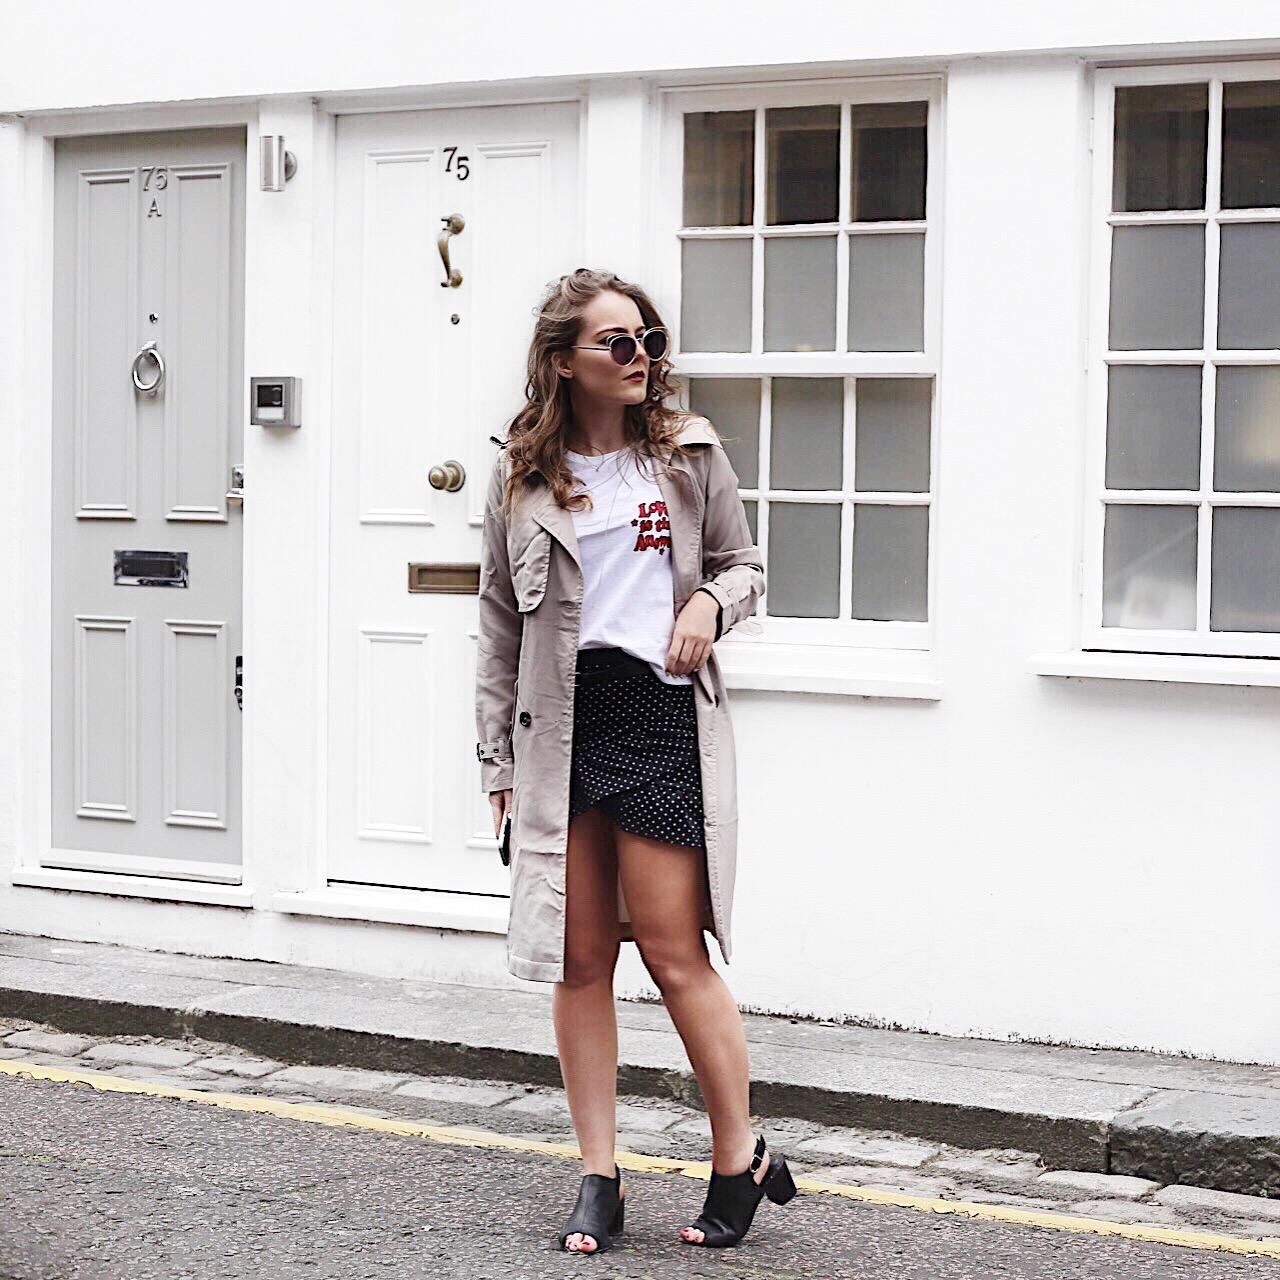 london based fashion blogger, london based style blogger, london based petite blogger, london petite style blogger, petite blogger, petite style blogger, london-based fashion blogger, trench coat women, jack wills trench coat, jack wills coats, trench coat guide, jack wills trench coat, jack wills, style guide